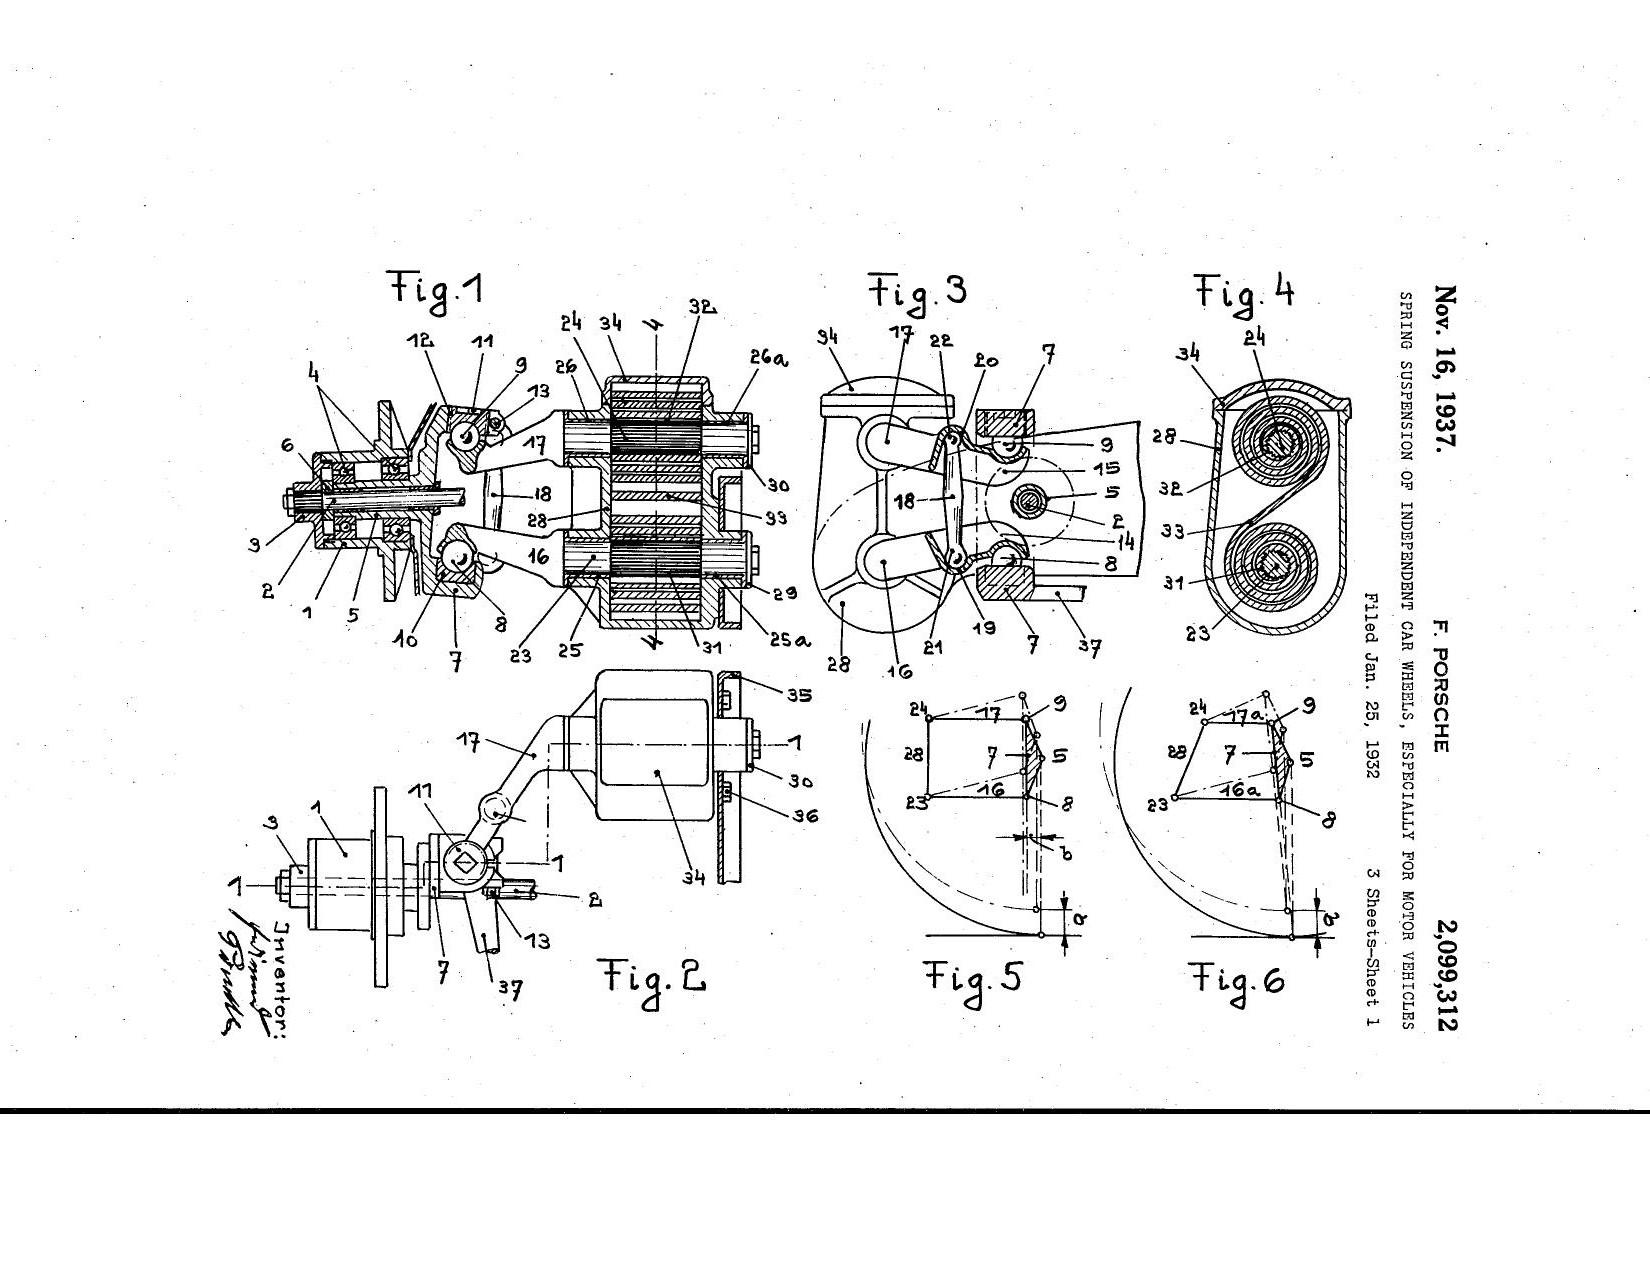 1948 Mack Truck Wiring Diagram. Diagram. Auto Wiring Diagram